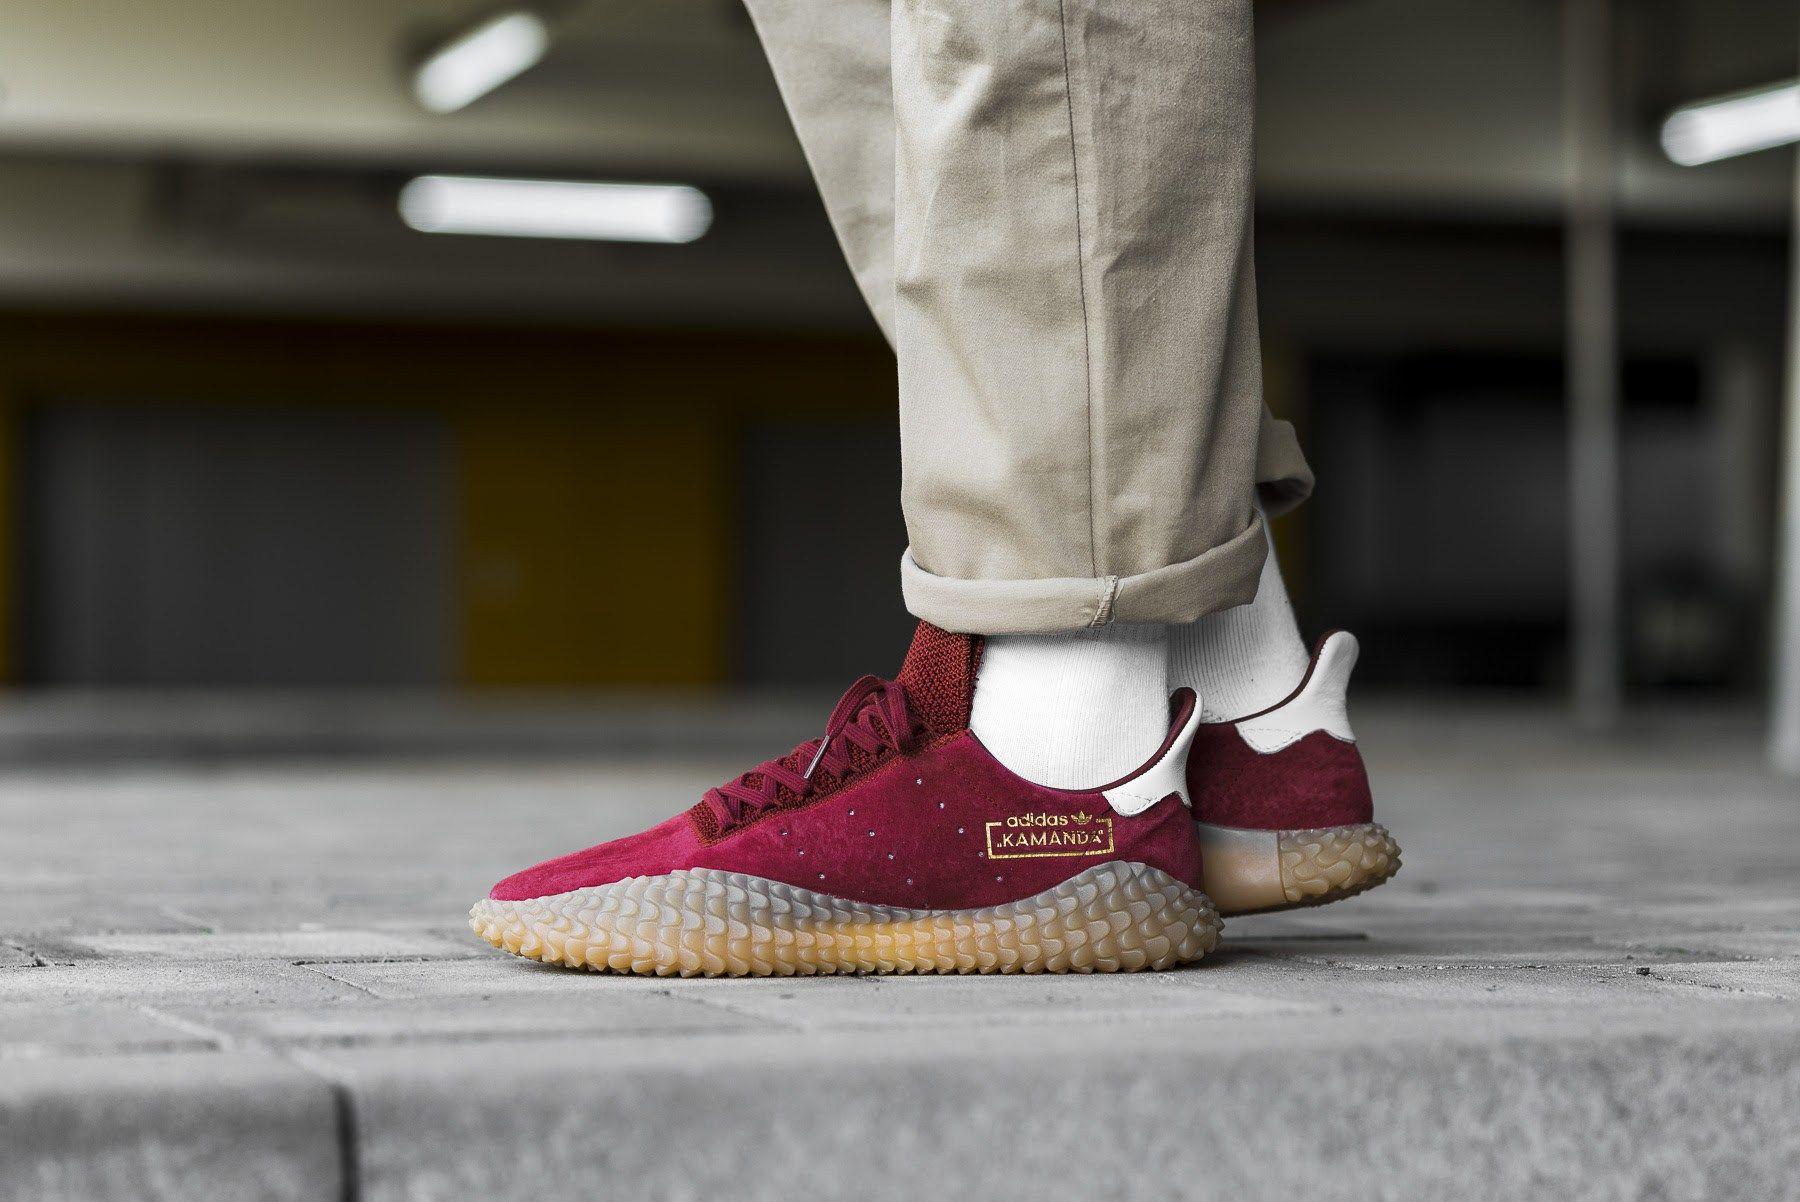 sports shoes 63d99 c39d5 adidas Kamanda On-Foot in Two Colorways - EU Kicks Sneaker Magazine